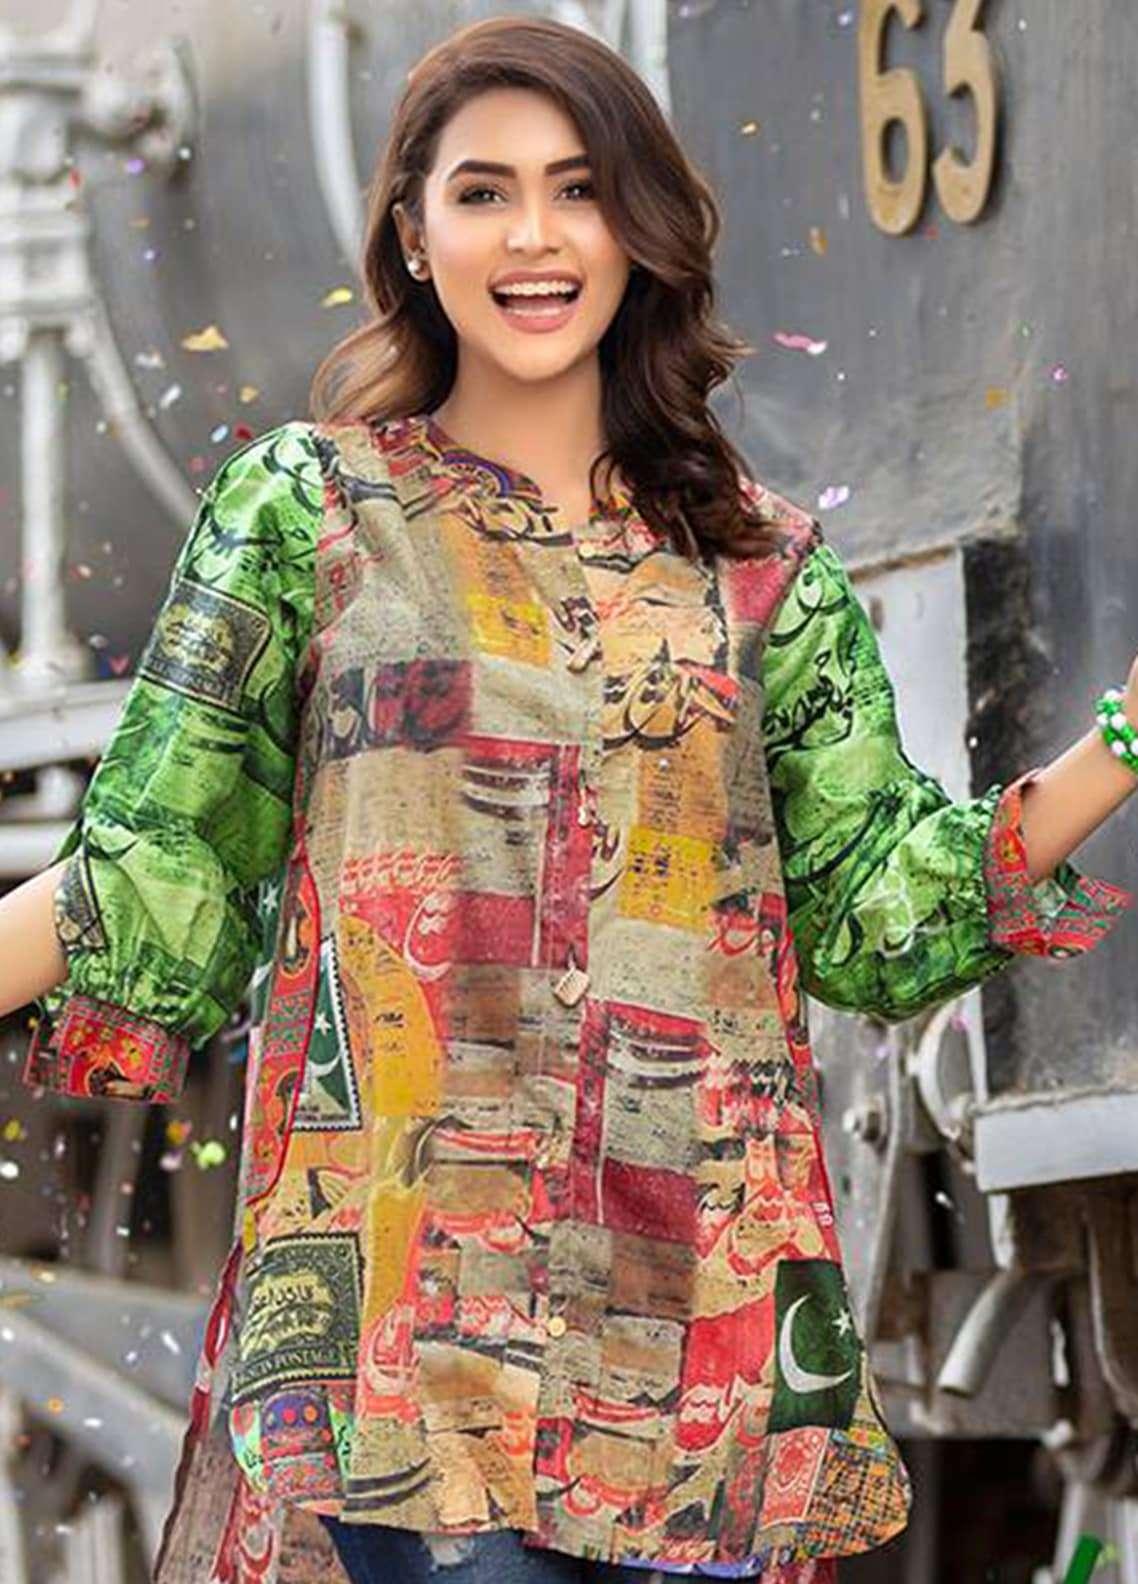 Al Zohaib Printed Cotton Silk Unstitched Kurties AZ18AK 05 - Independence Outfit